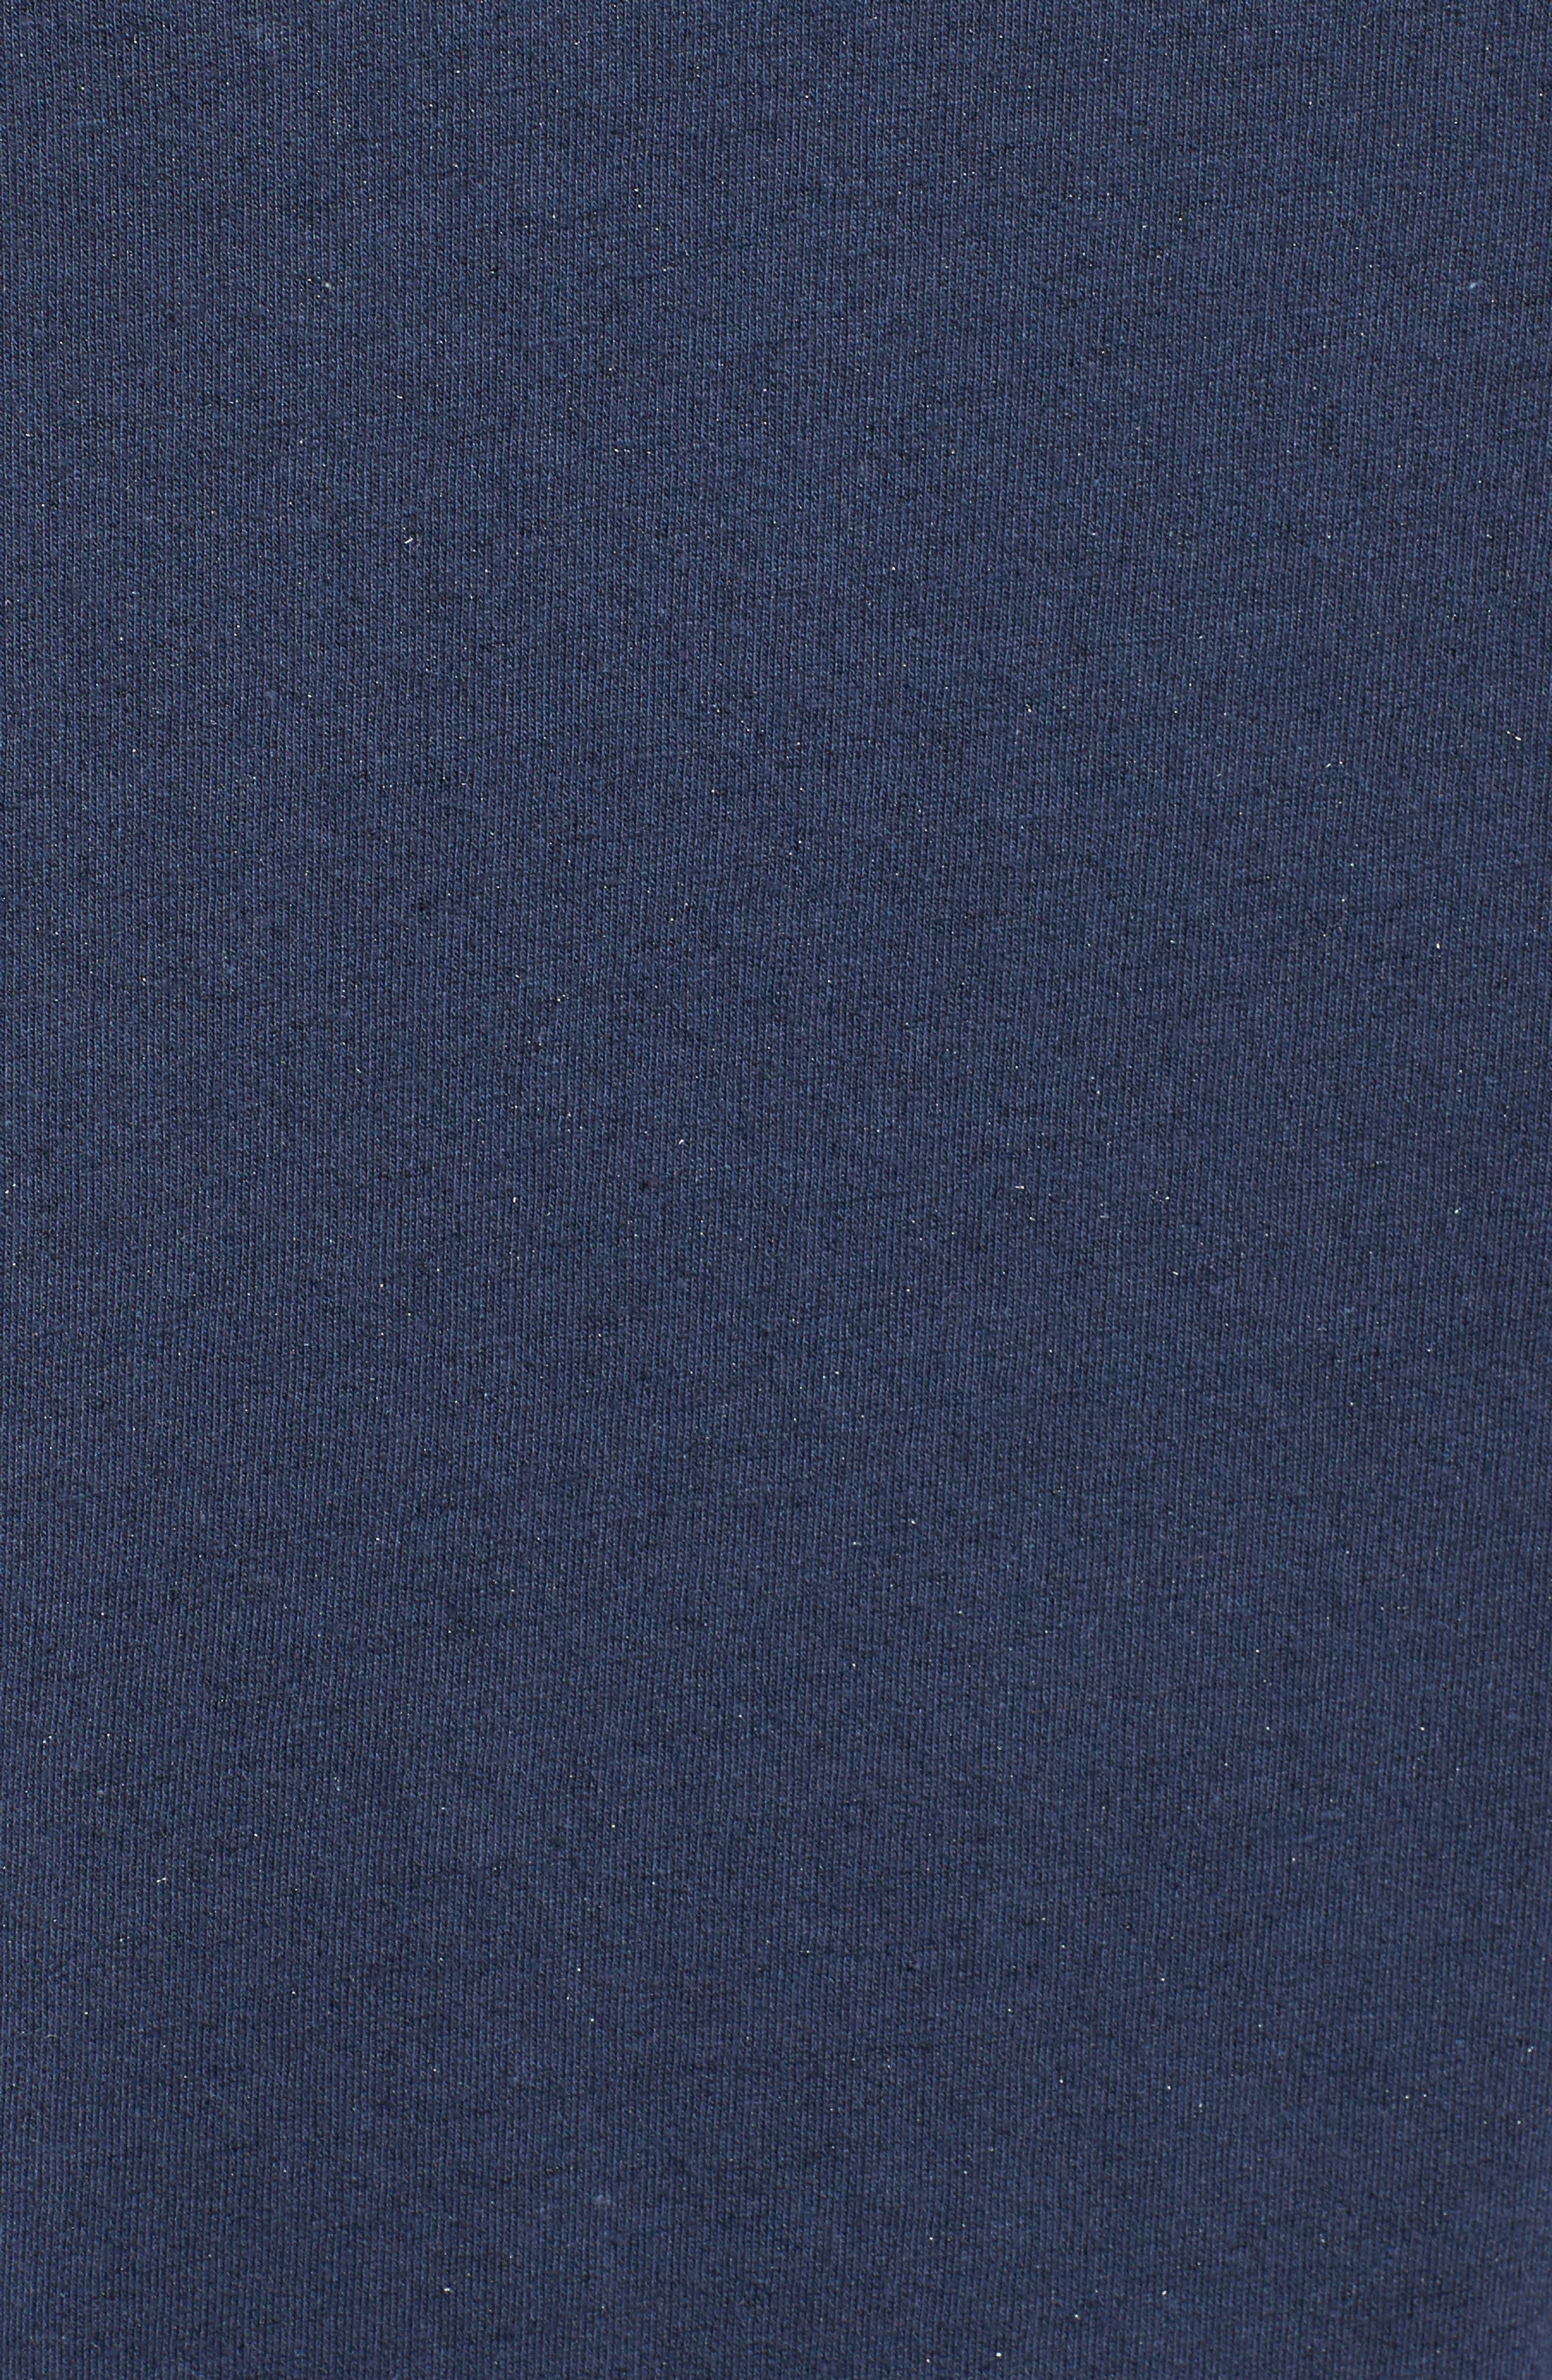 Stella Knit Jacket,                             Alternate thumbnail 55, color,